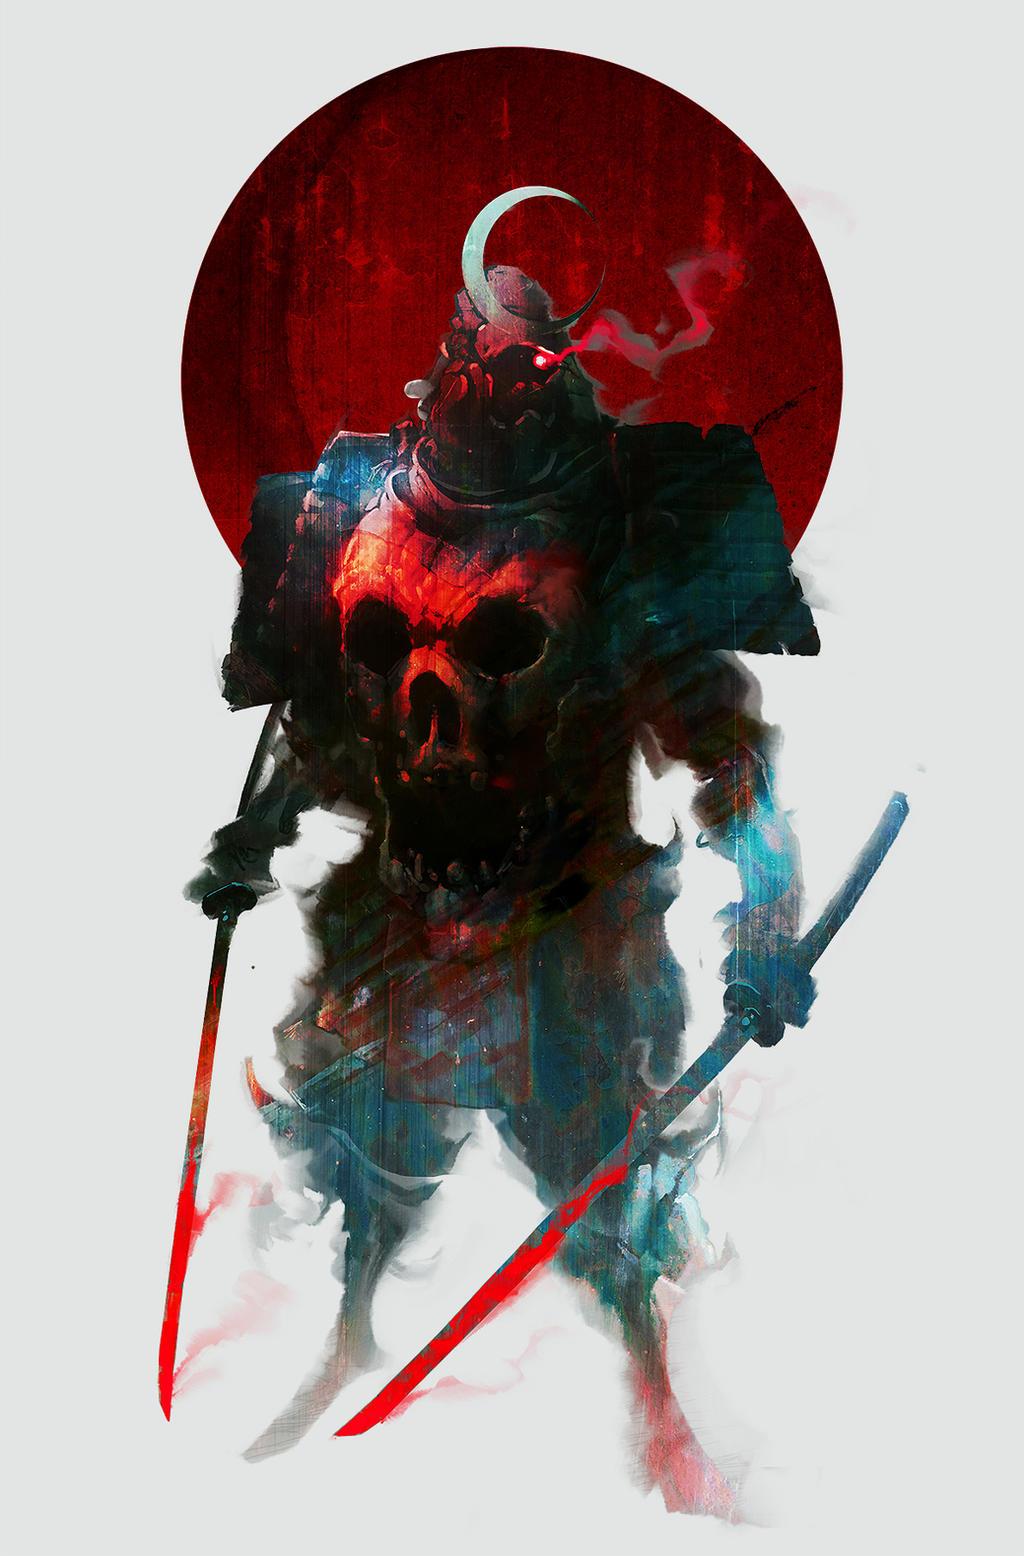 Fate/Destiny Order Powerful Glory Of The Immortal Gods Of Unbreakable Hope - Página 2 Niten_ichiryu_bishamon_by_cobaltplasma-d84dtx8